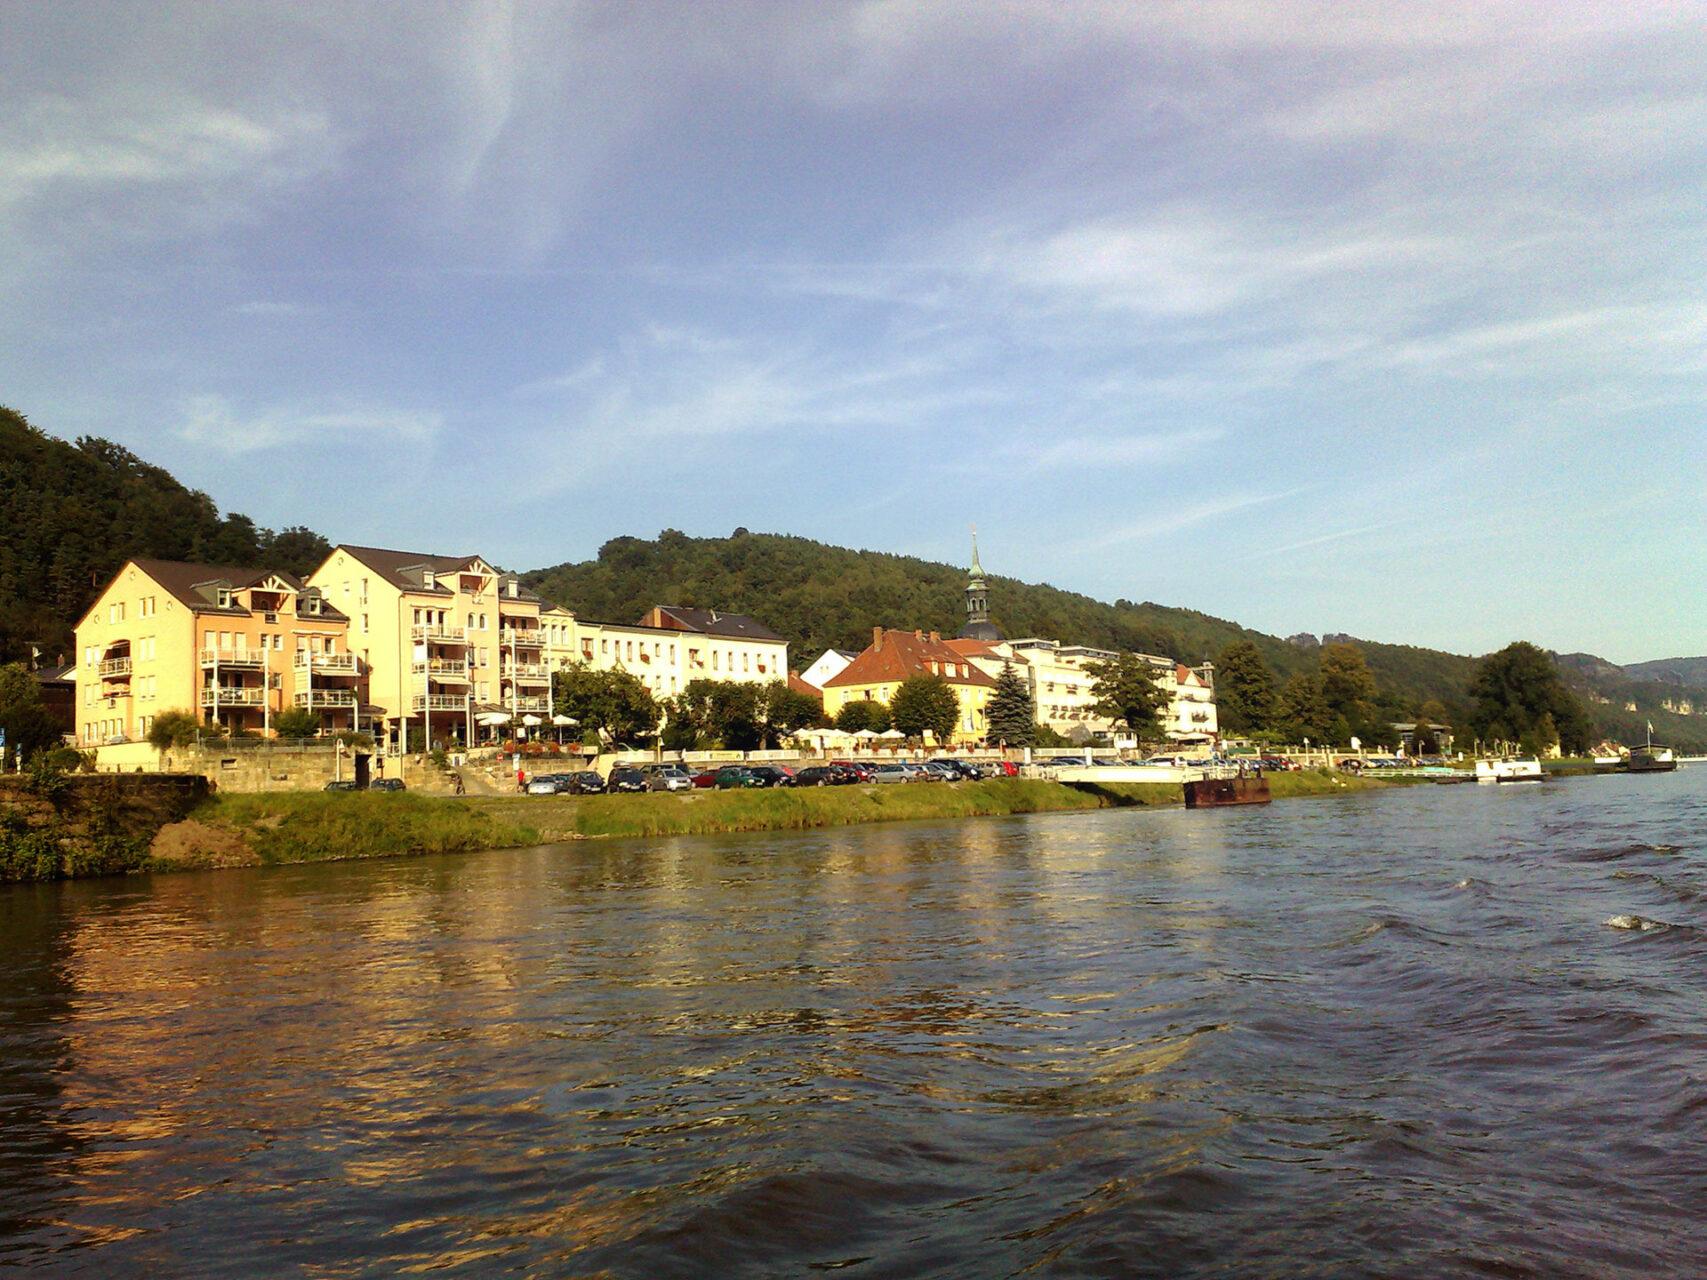 Bad Schandau. Ausgangspunkt oder Endpunkt der Wanderung. Je nachdem wo man startet.